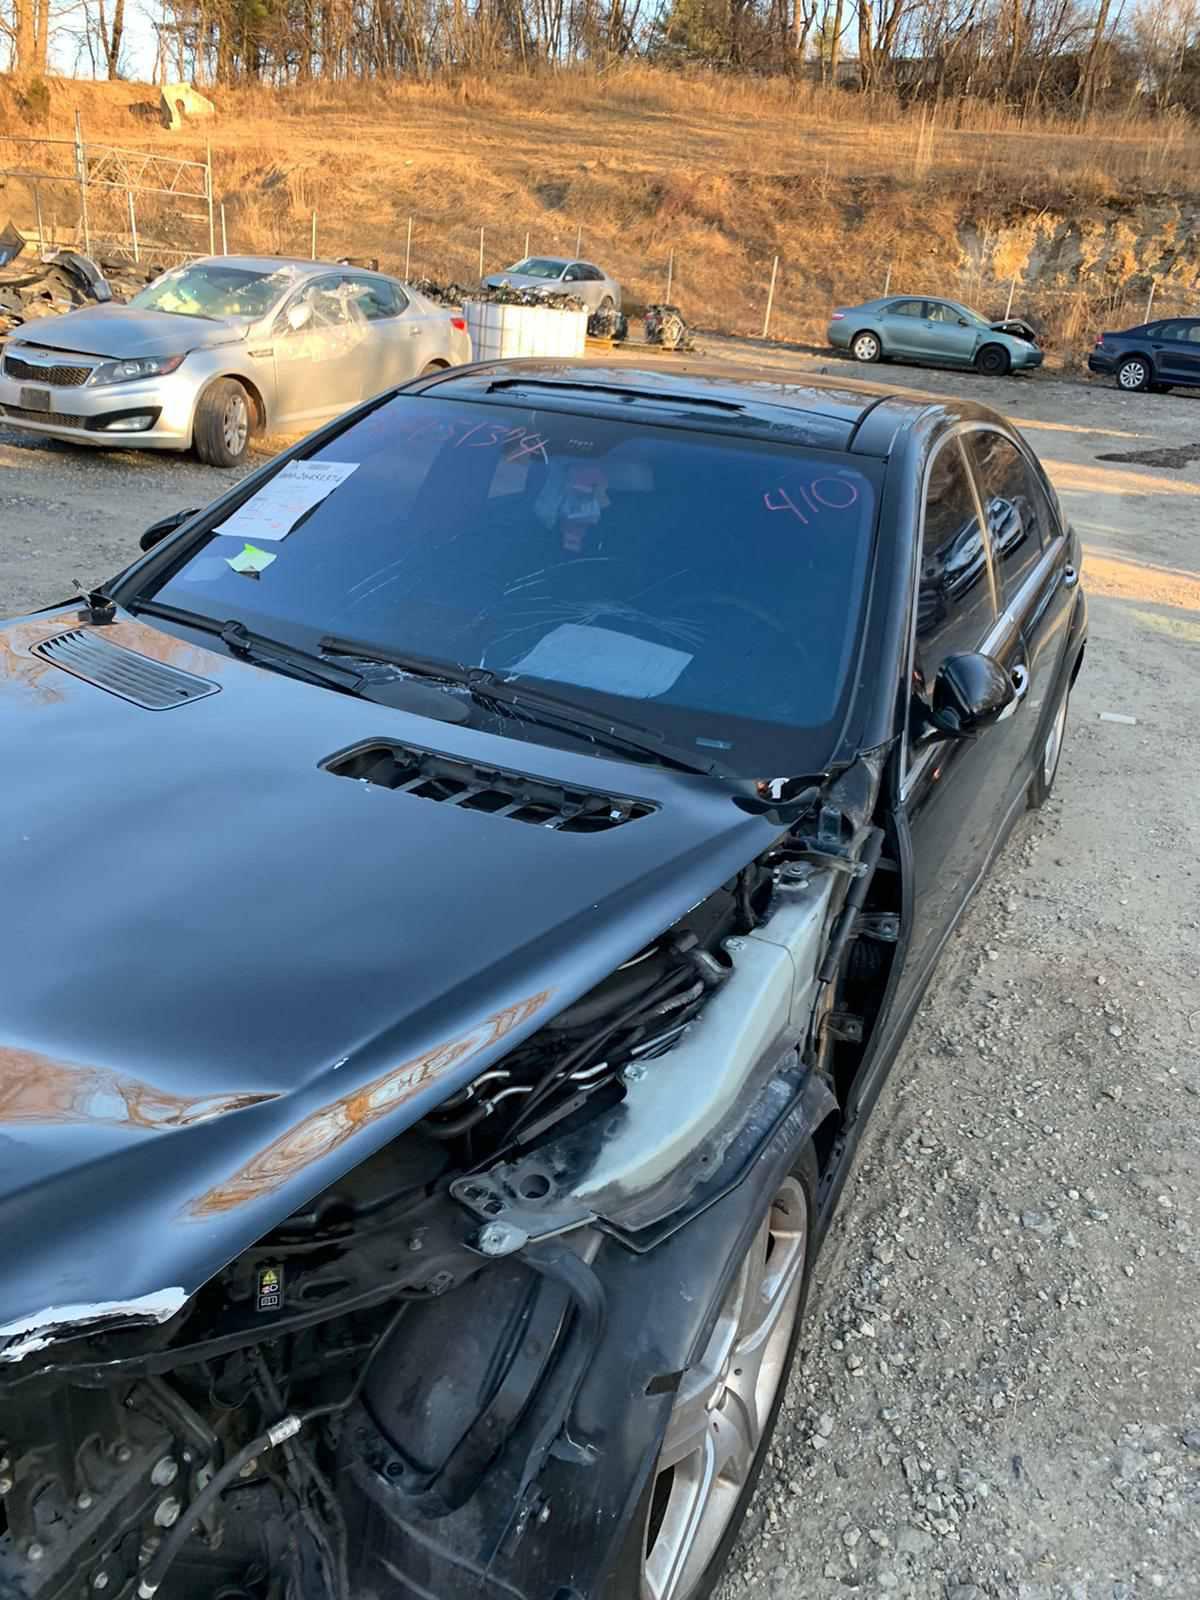 авторазборка Mercedes W221 S Class детали мерседес 221 Днепр